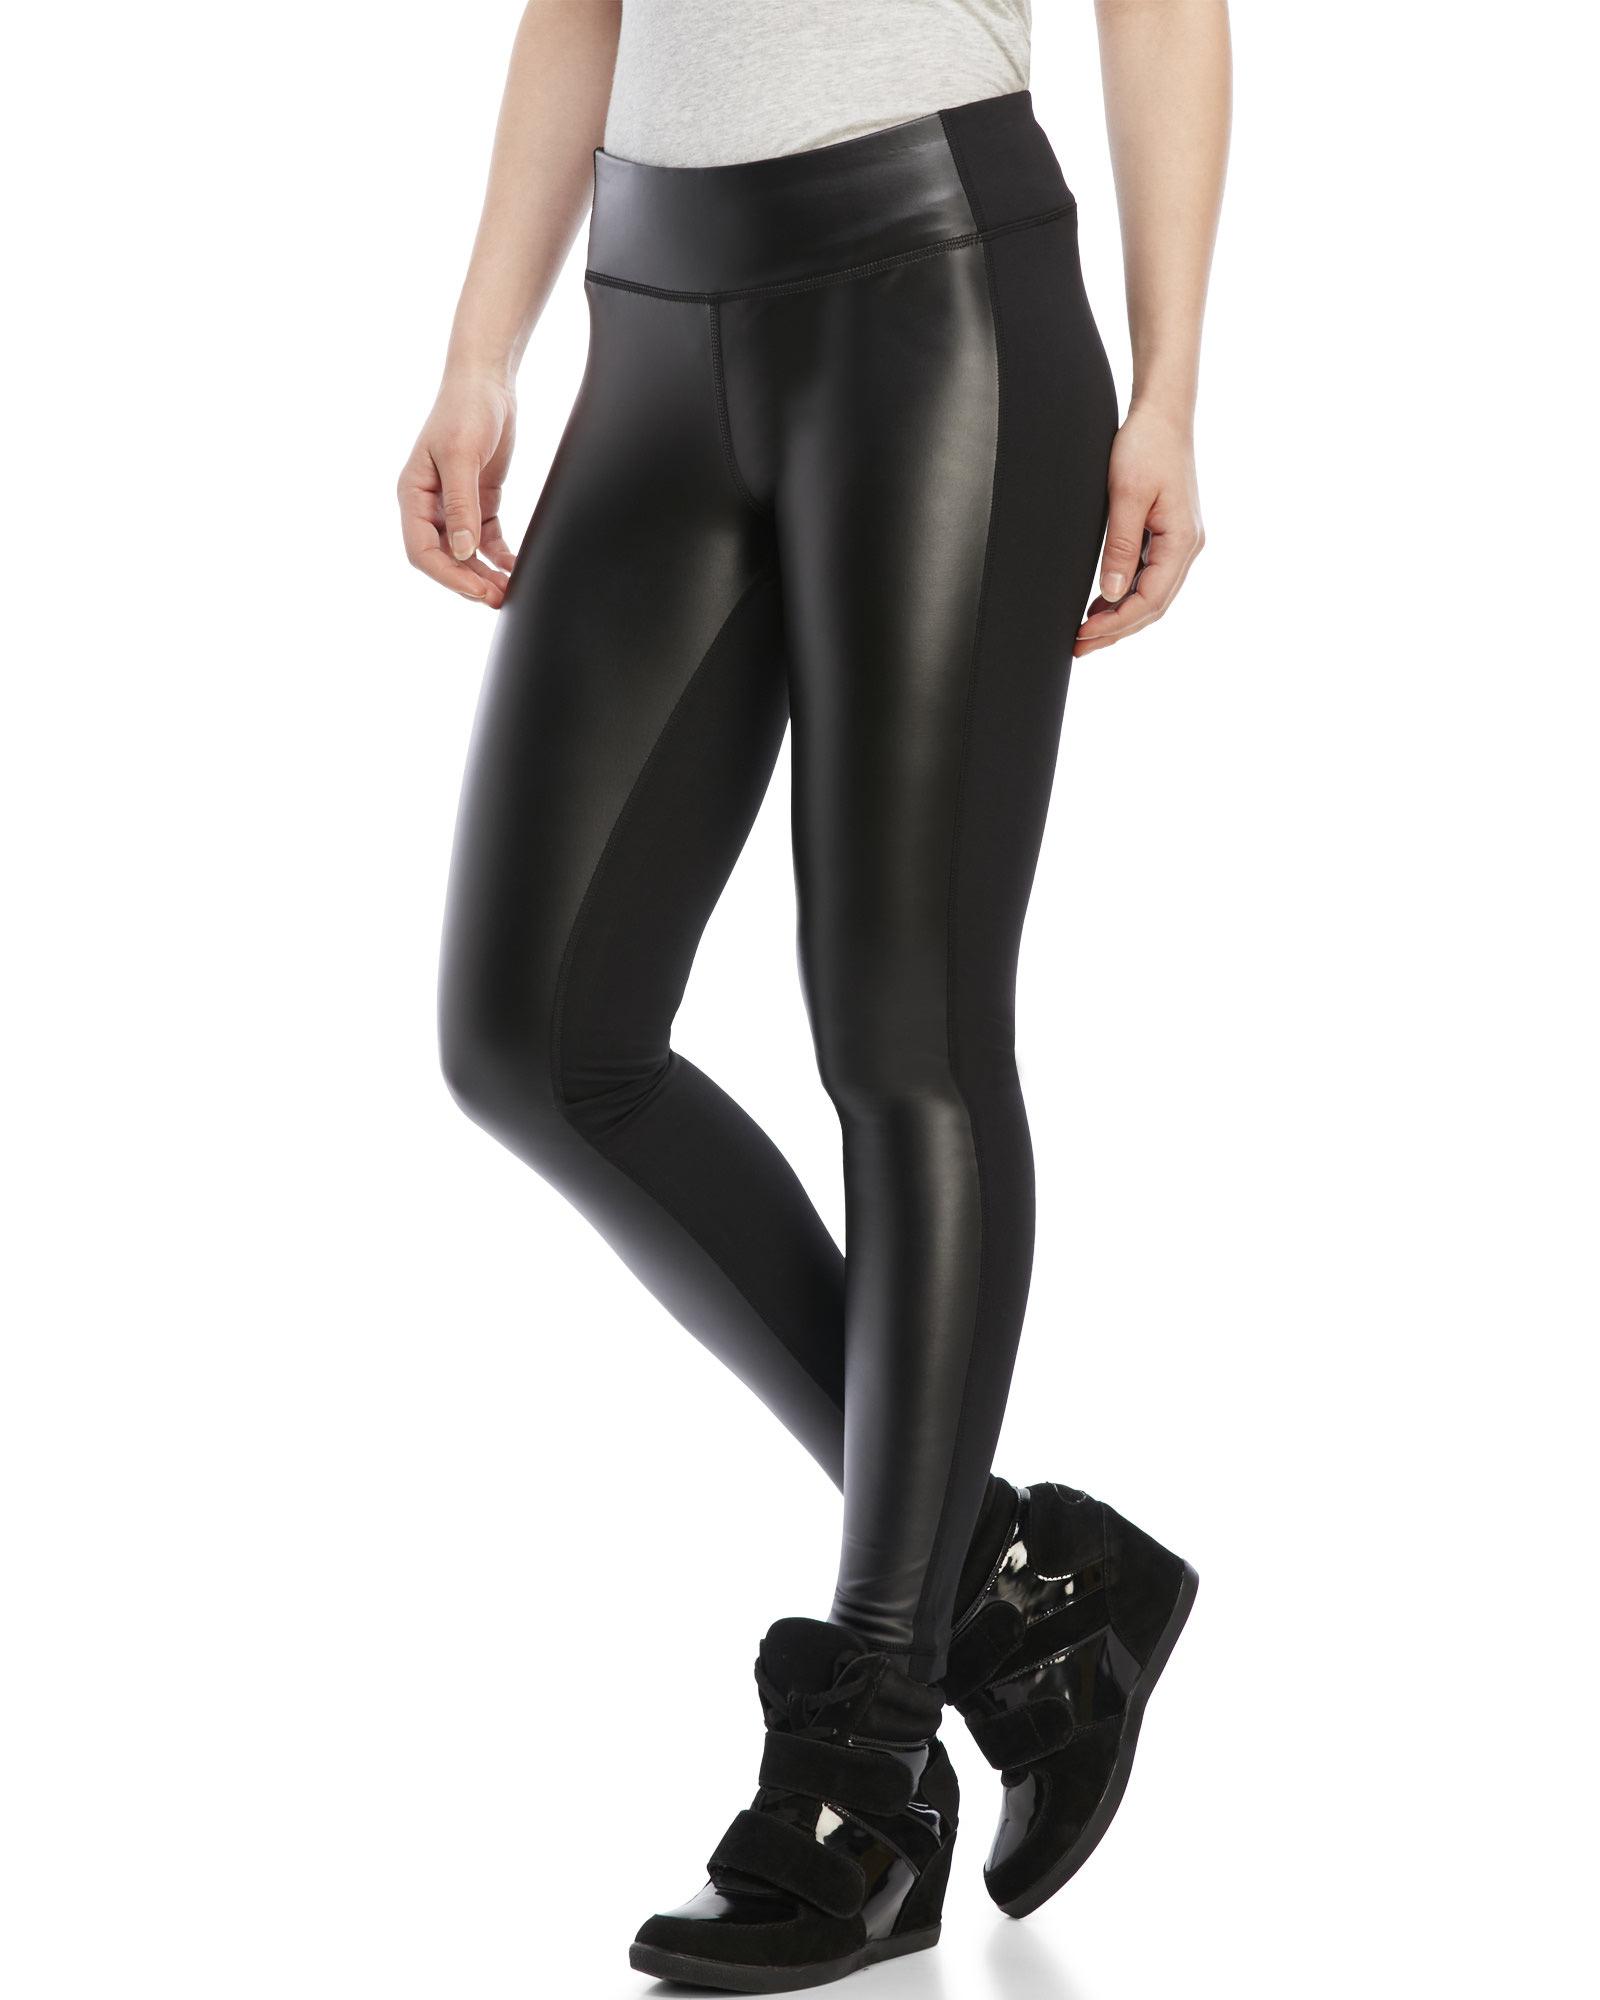 89e8b88ed068 Lyst - 90 Degree By Reflex Faux Leather Front Leggings in Black